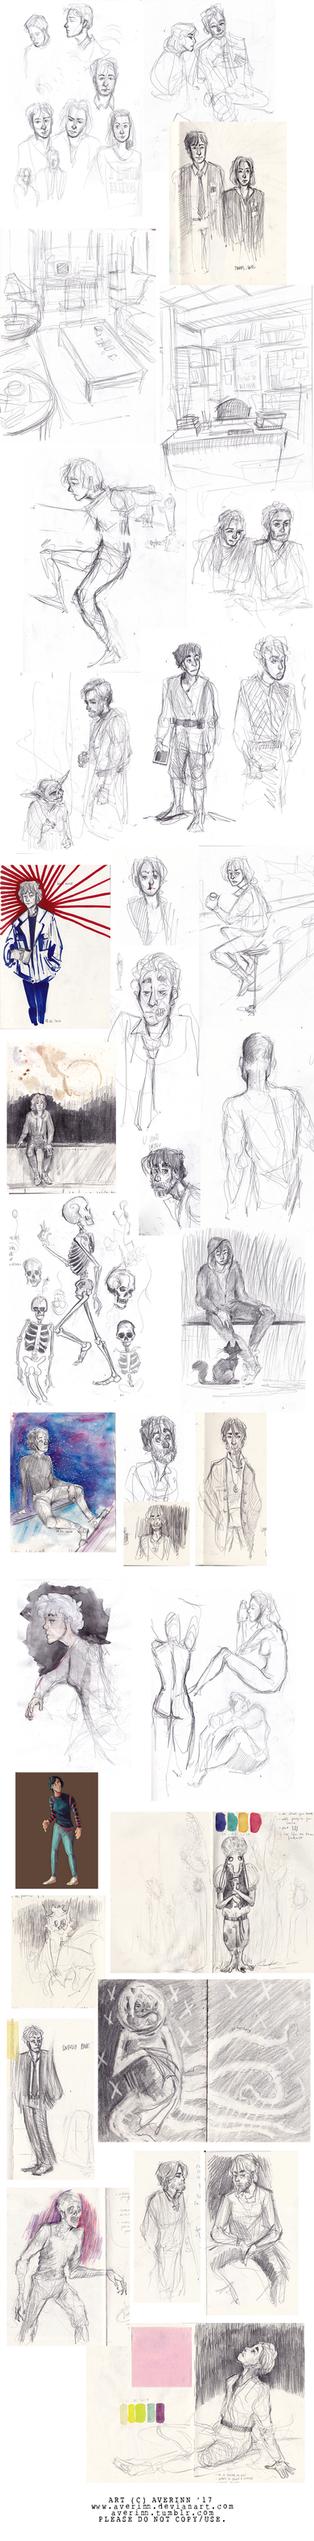 Sketchdump 005 by Averinn